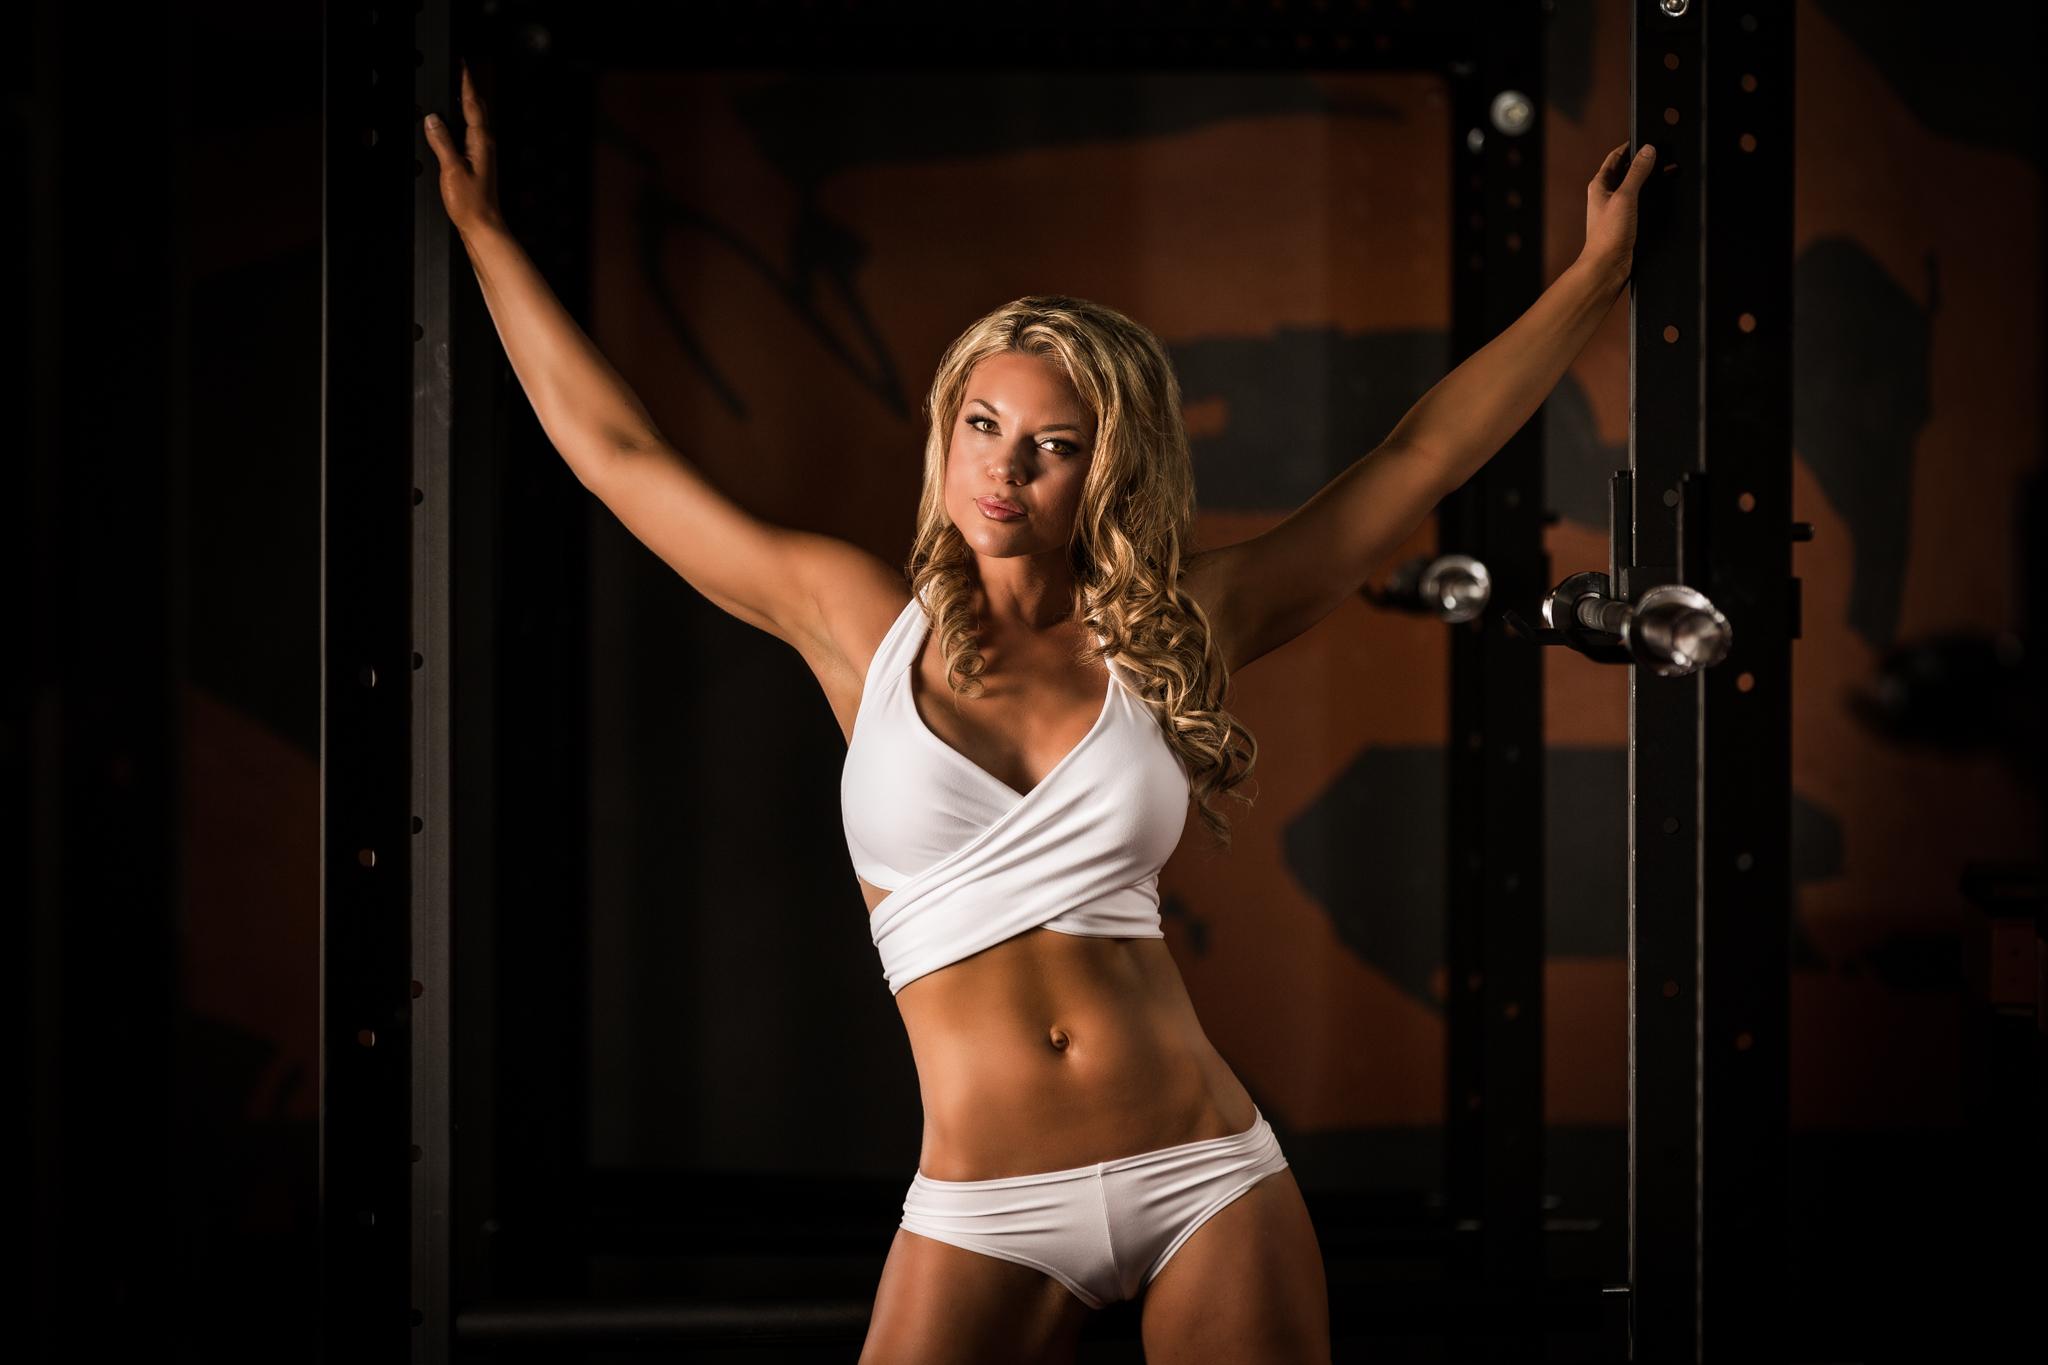 dover-new-hampshire-boston-fitness-photographer-photography-studio-05.jpg